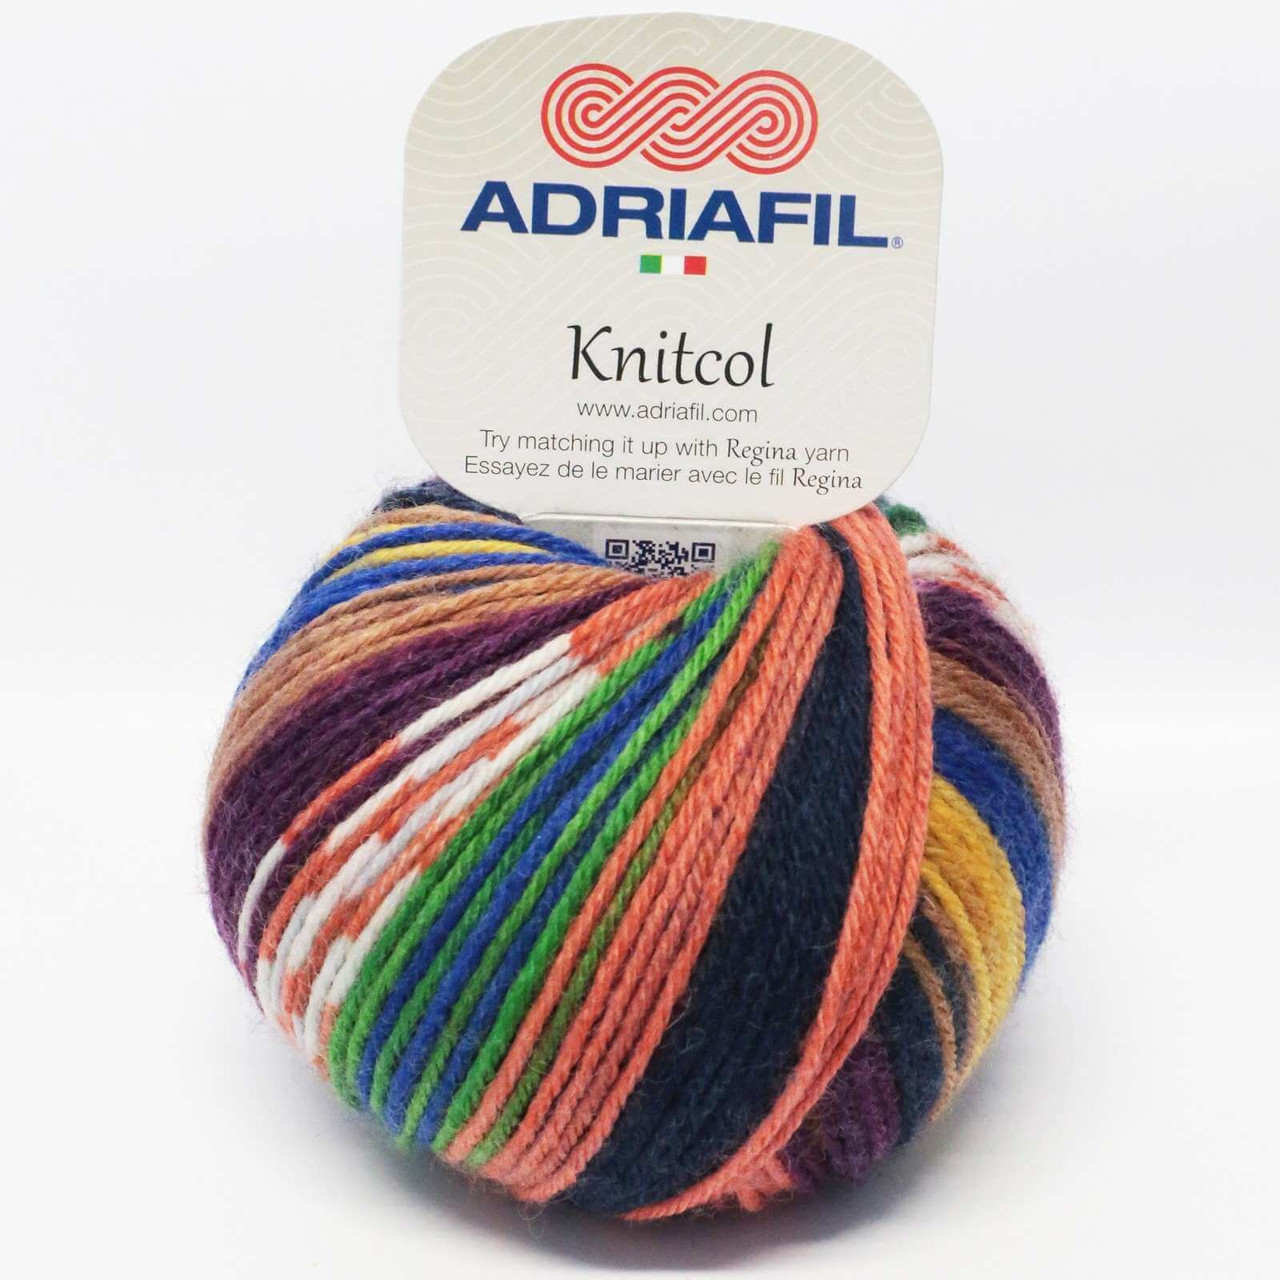 Adriafil knitting pattern using Regina Yarn